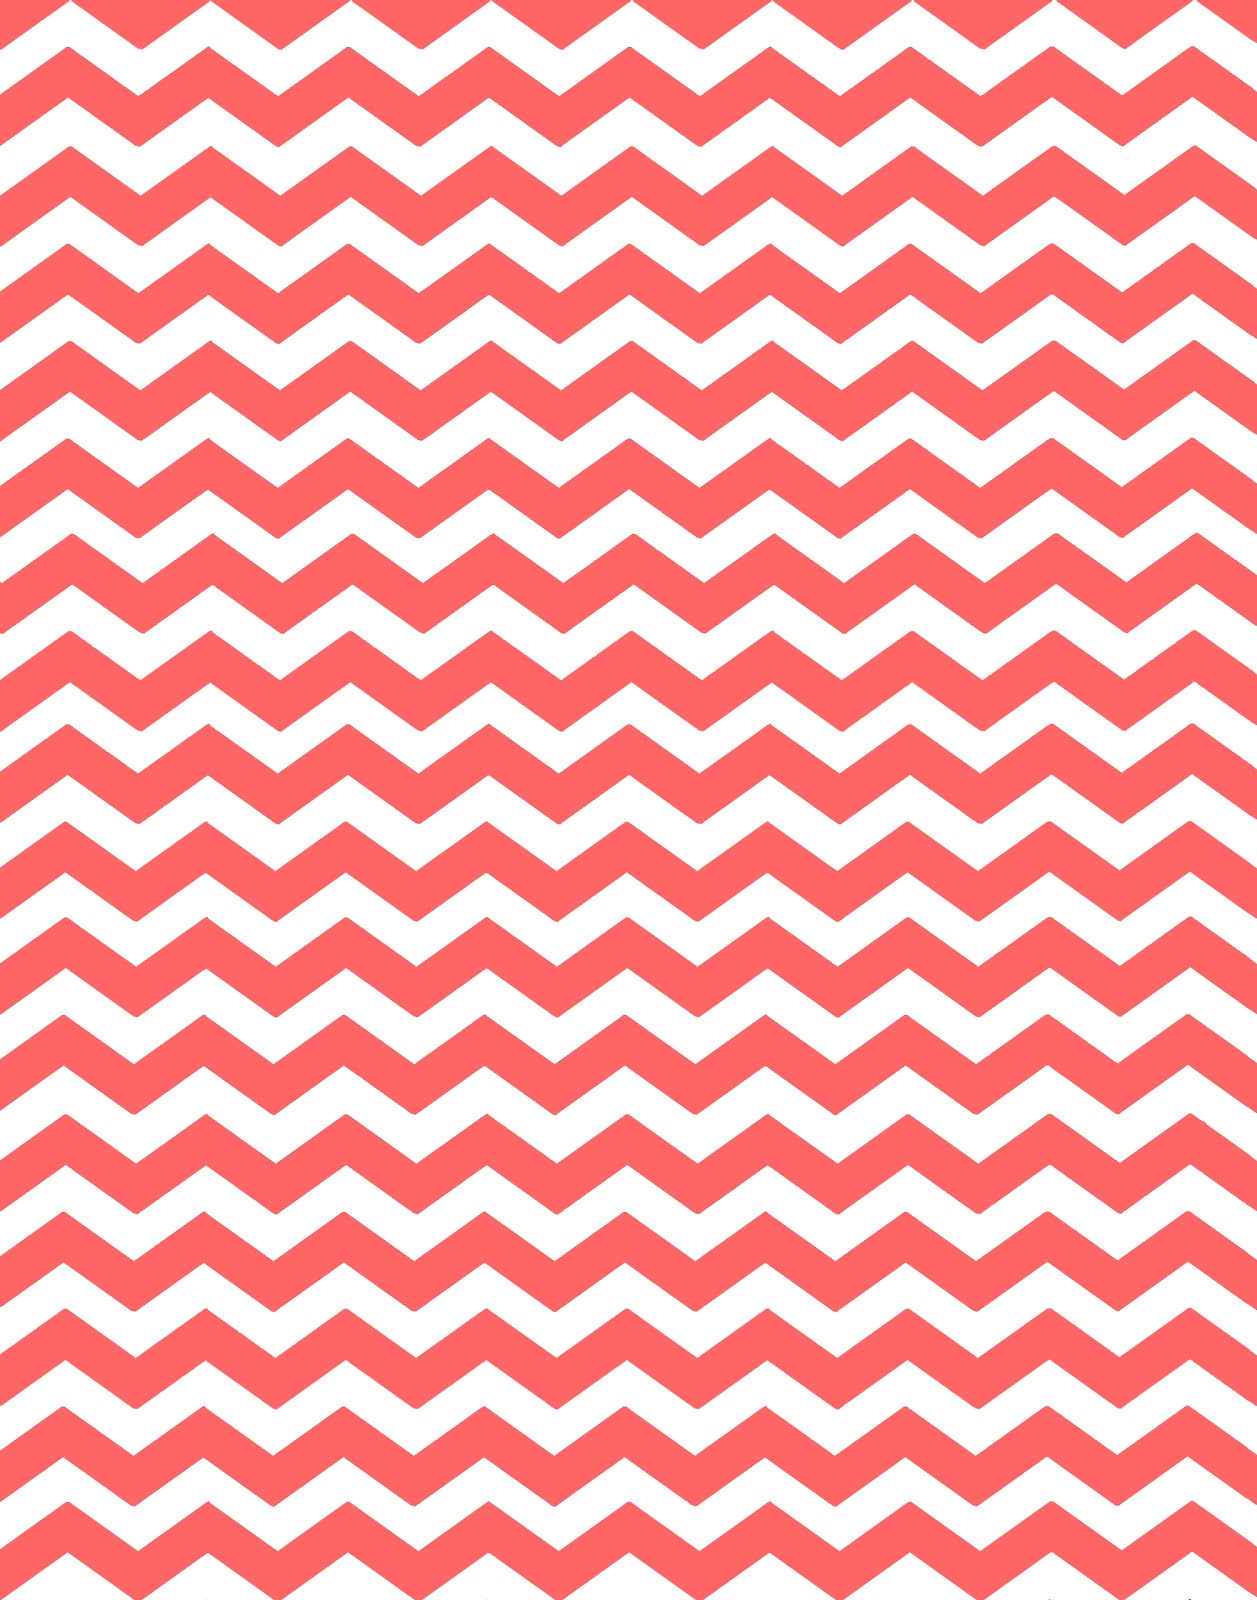 Teal and Coral Wallpapers - WallpaperSafari